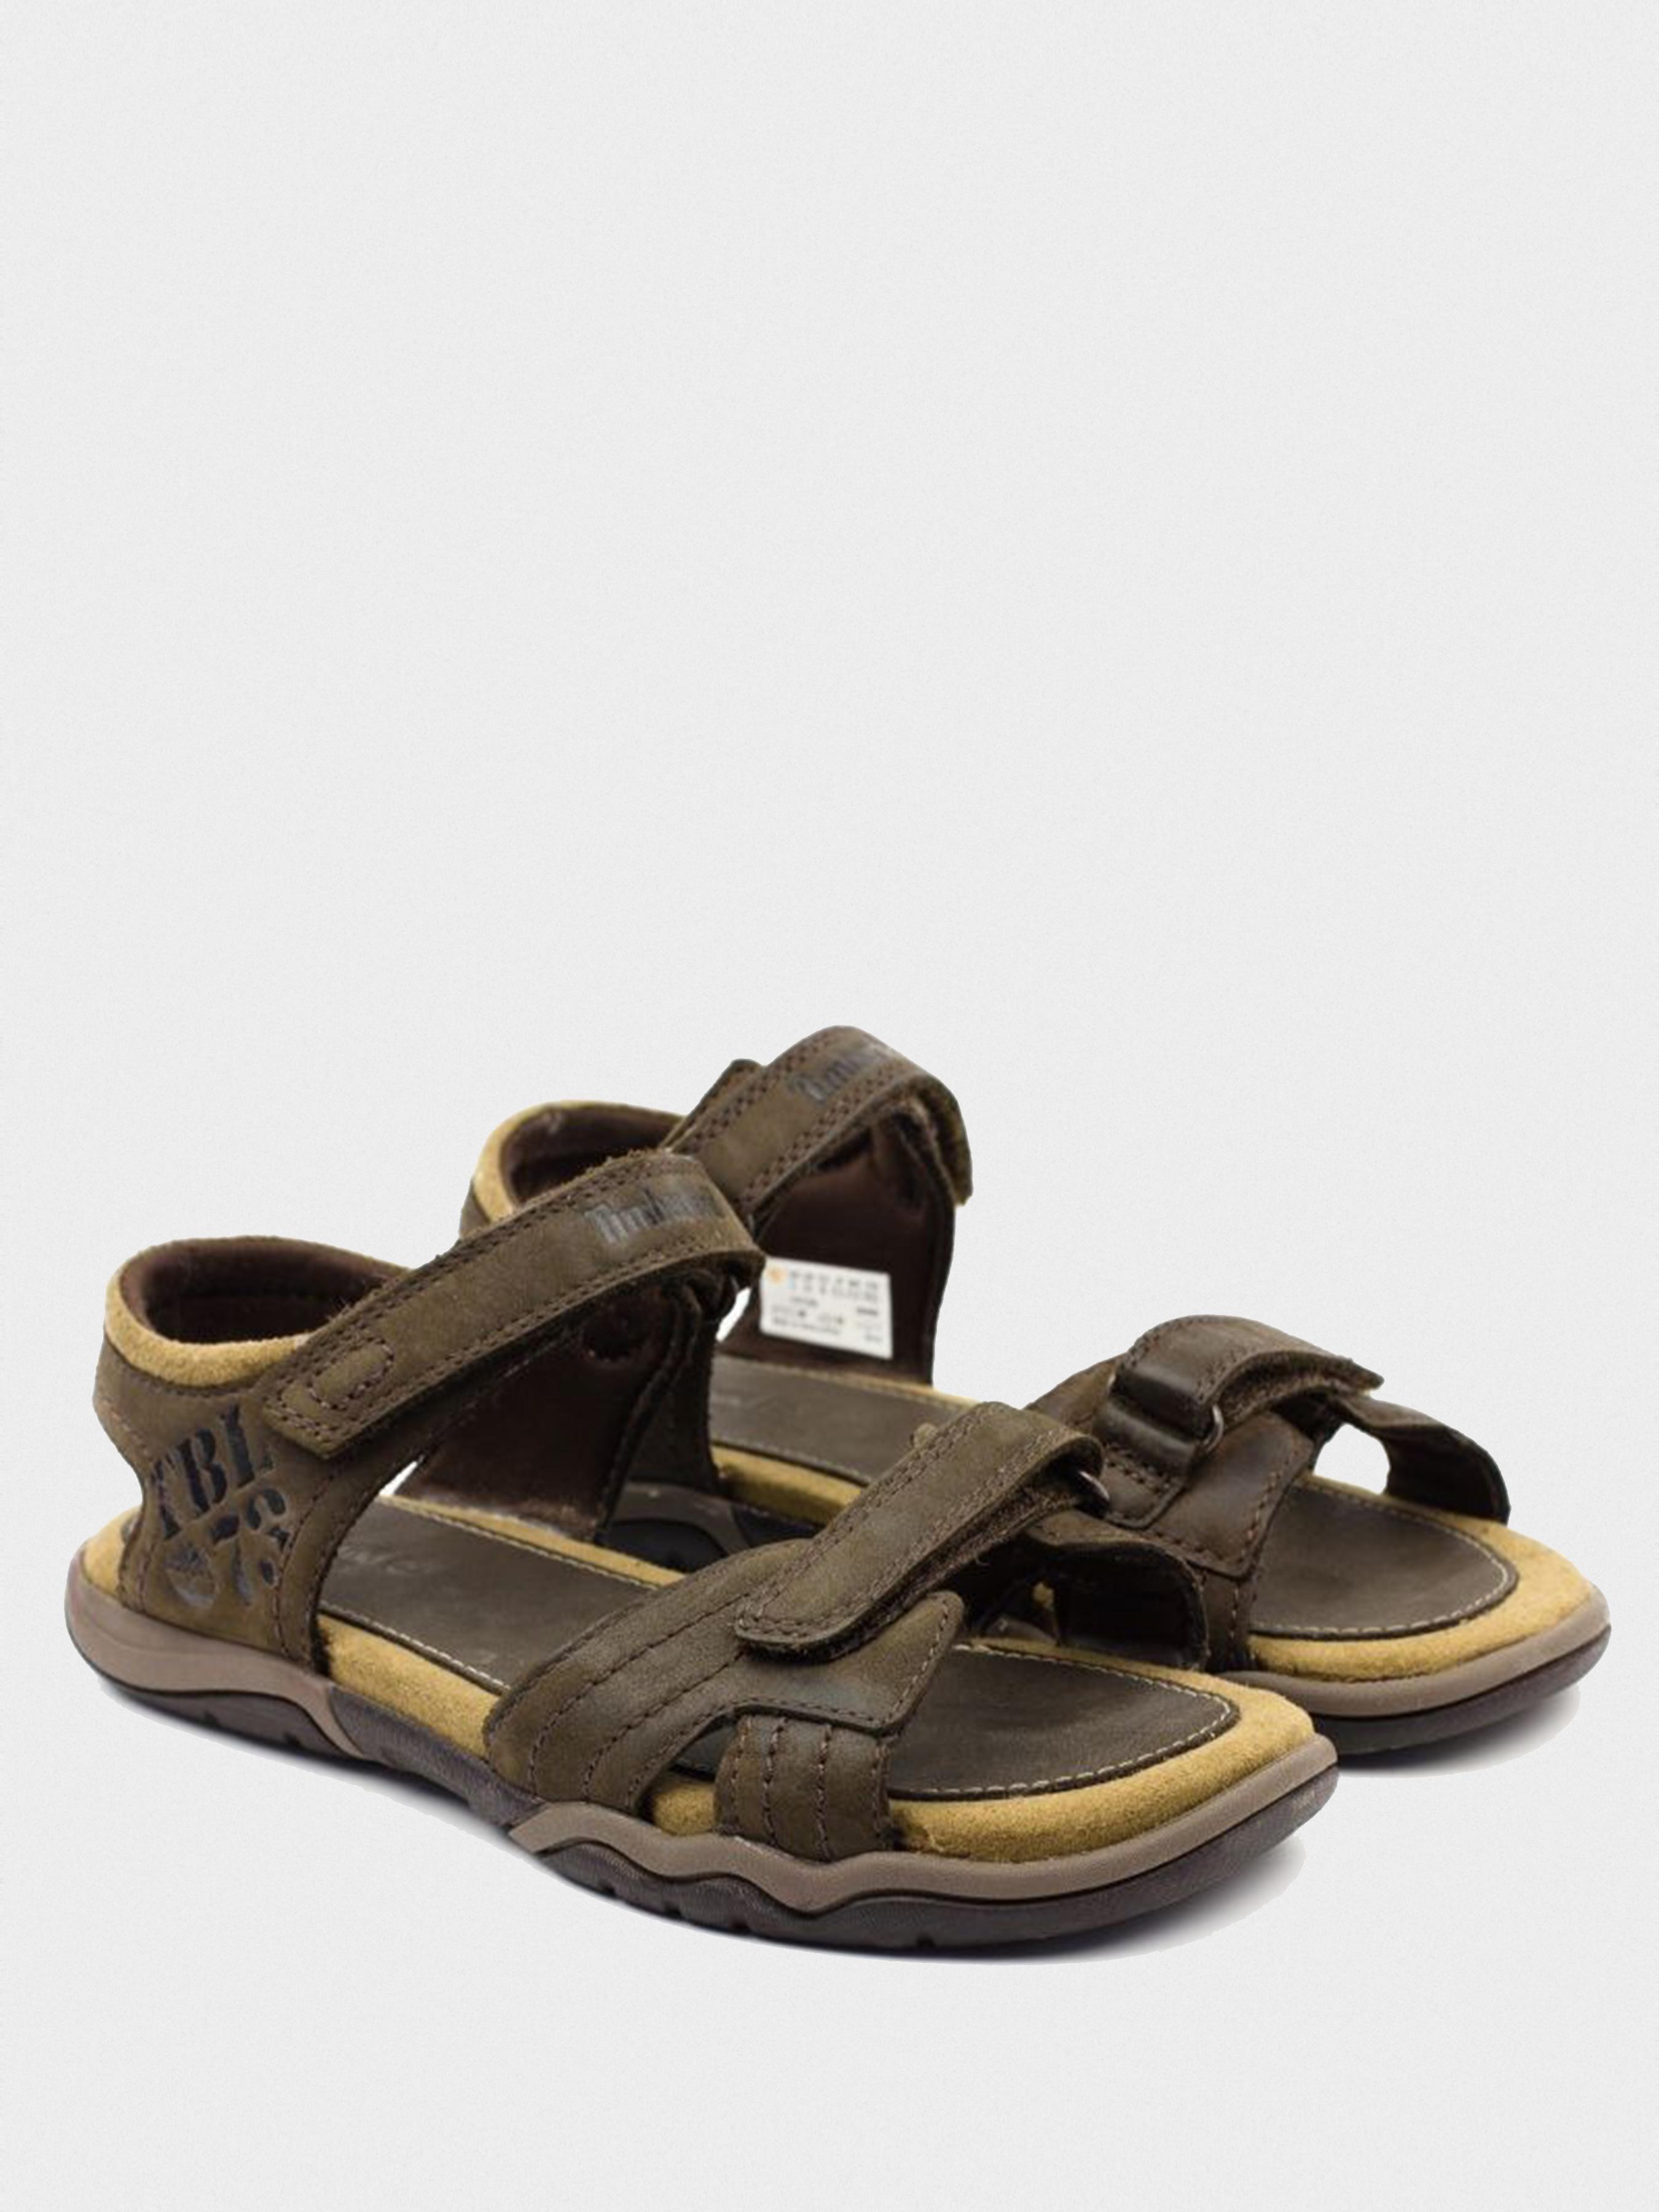 Сандалии для детей Timberland OAKBLFFSEKLTH2STRP D DARK BROW TL1244 брендовая обувь, 2017